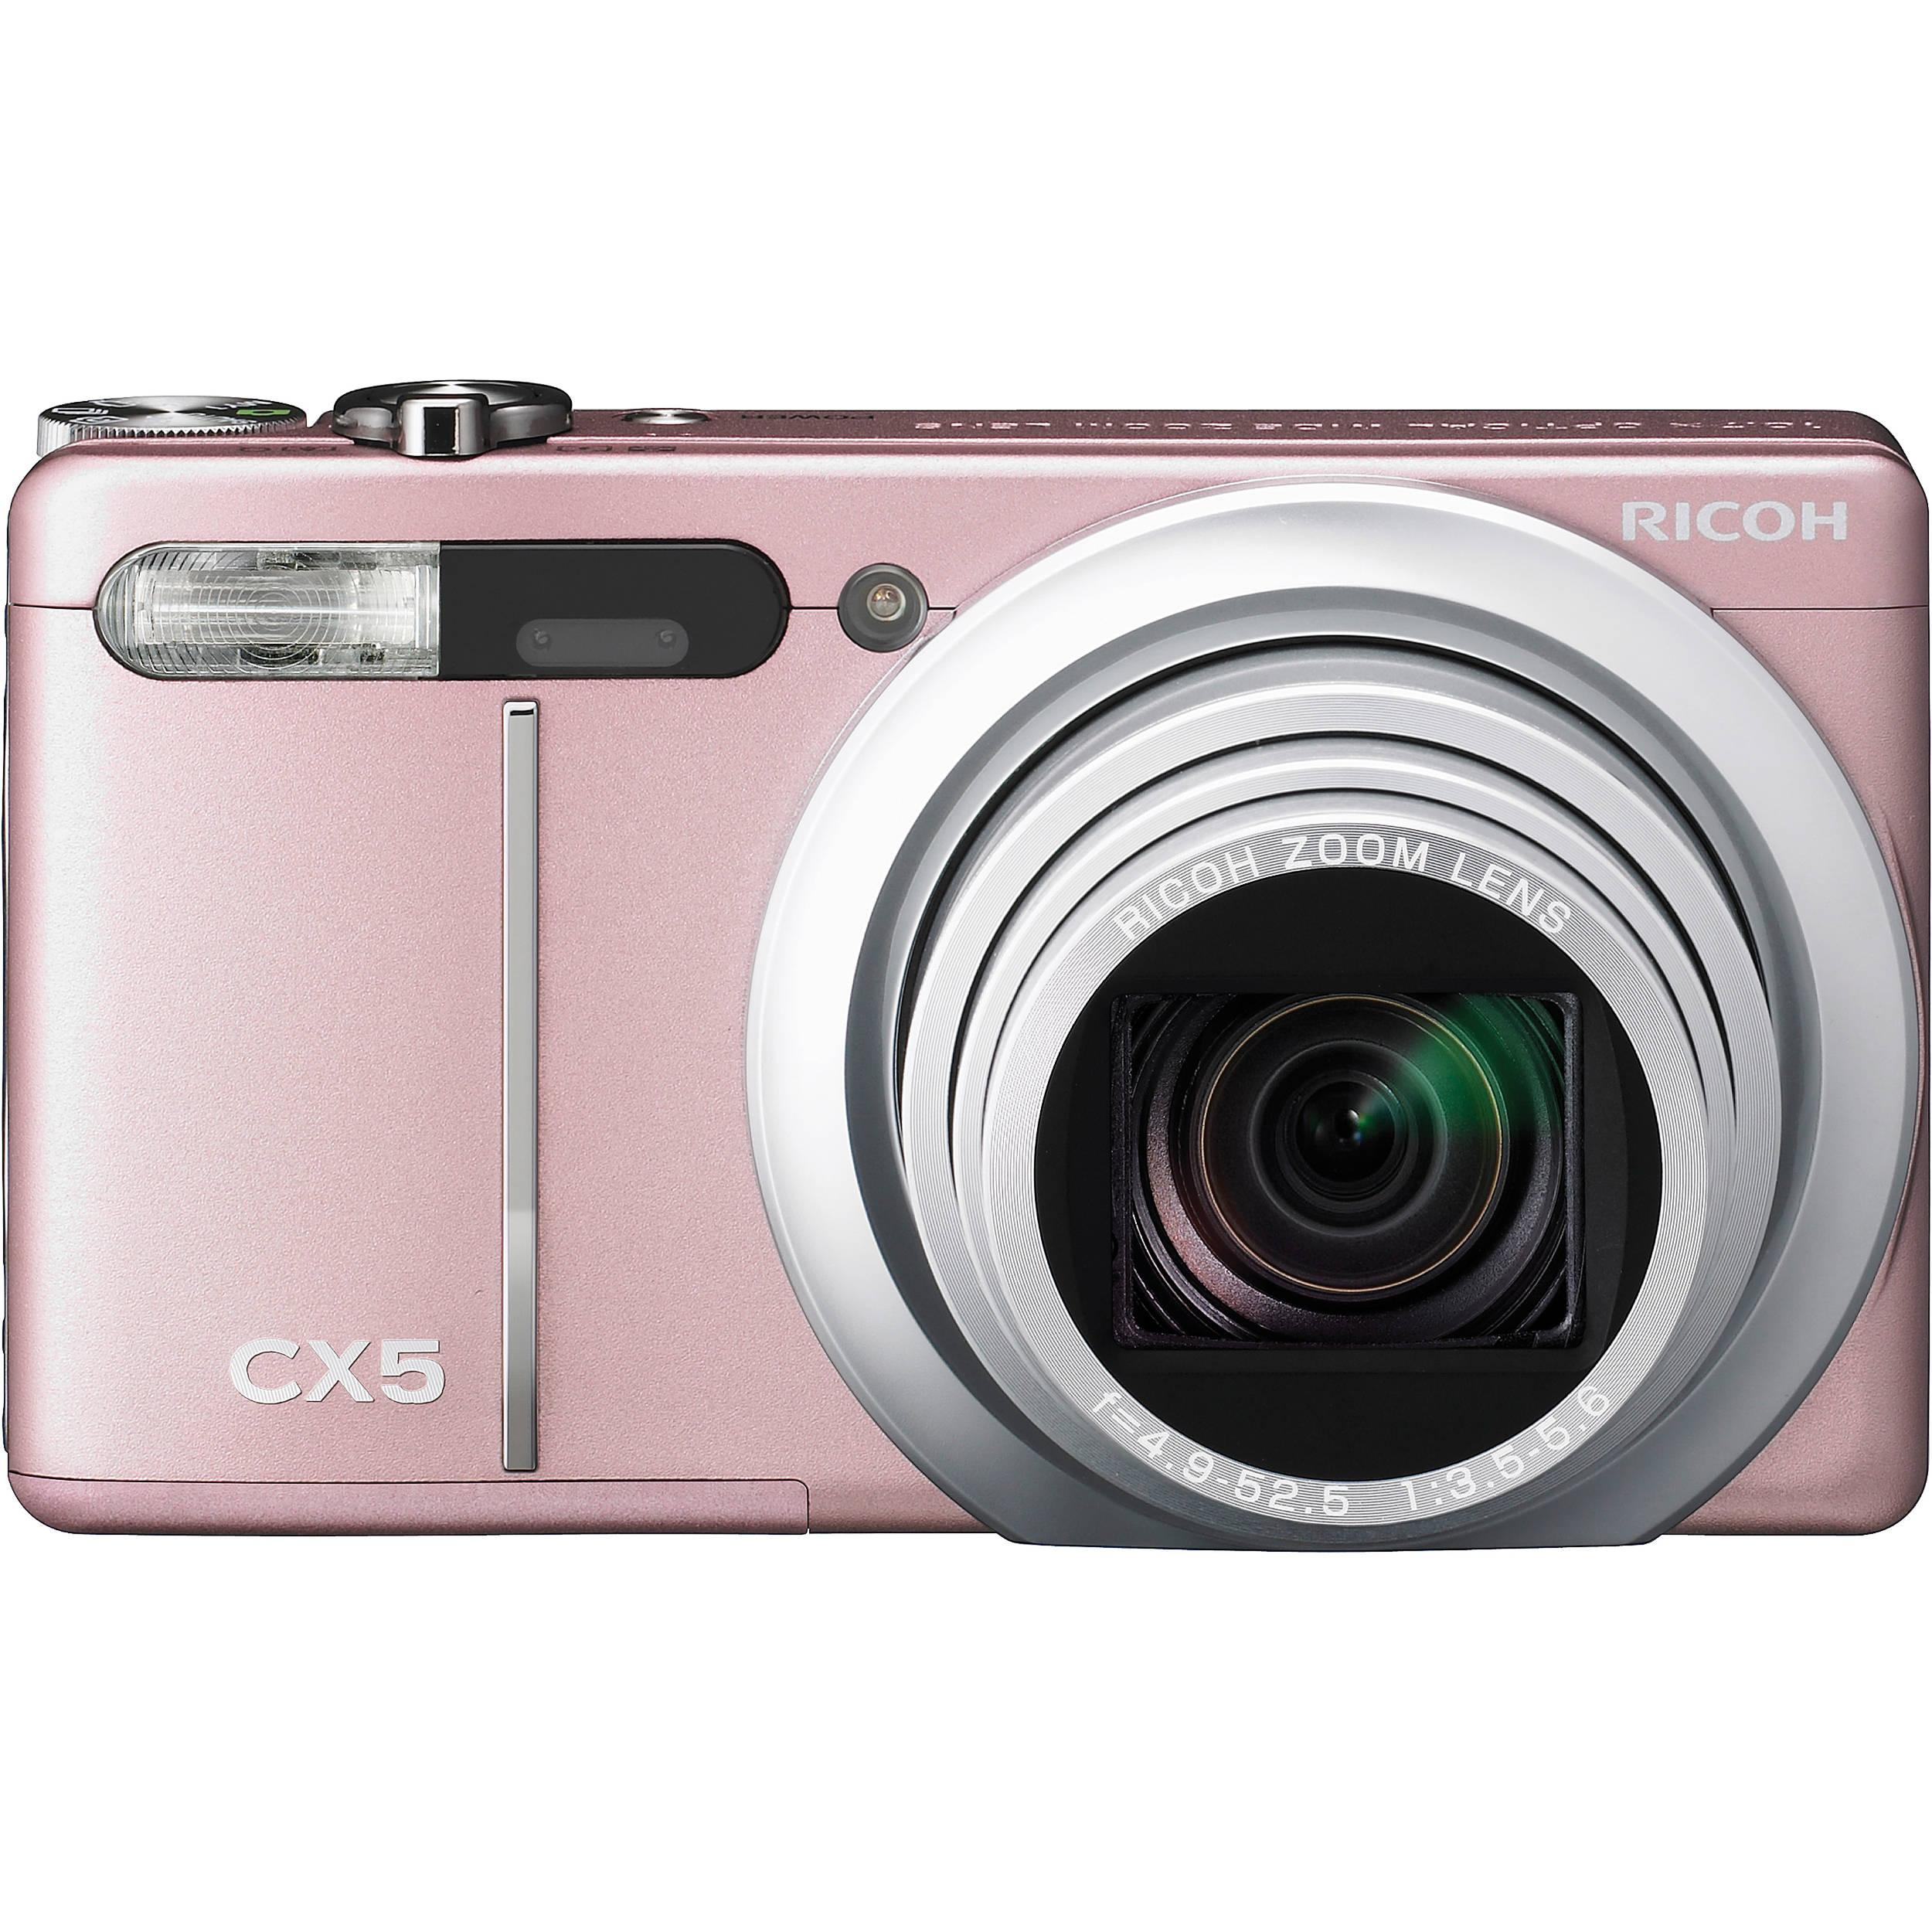 Ricoh CX5 Digital Camera Drivers Windows